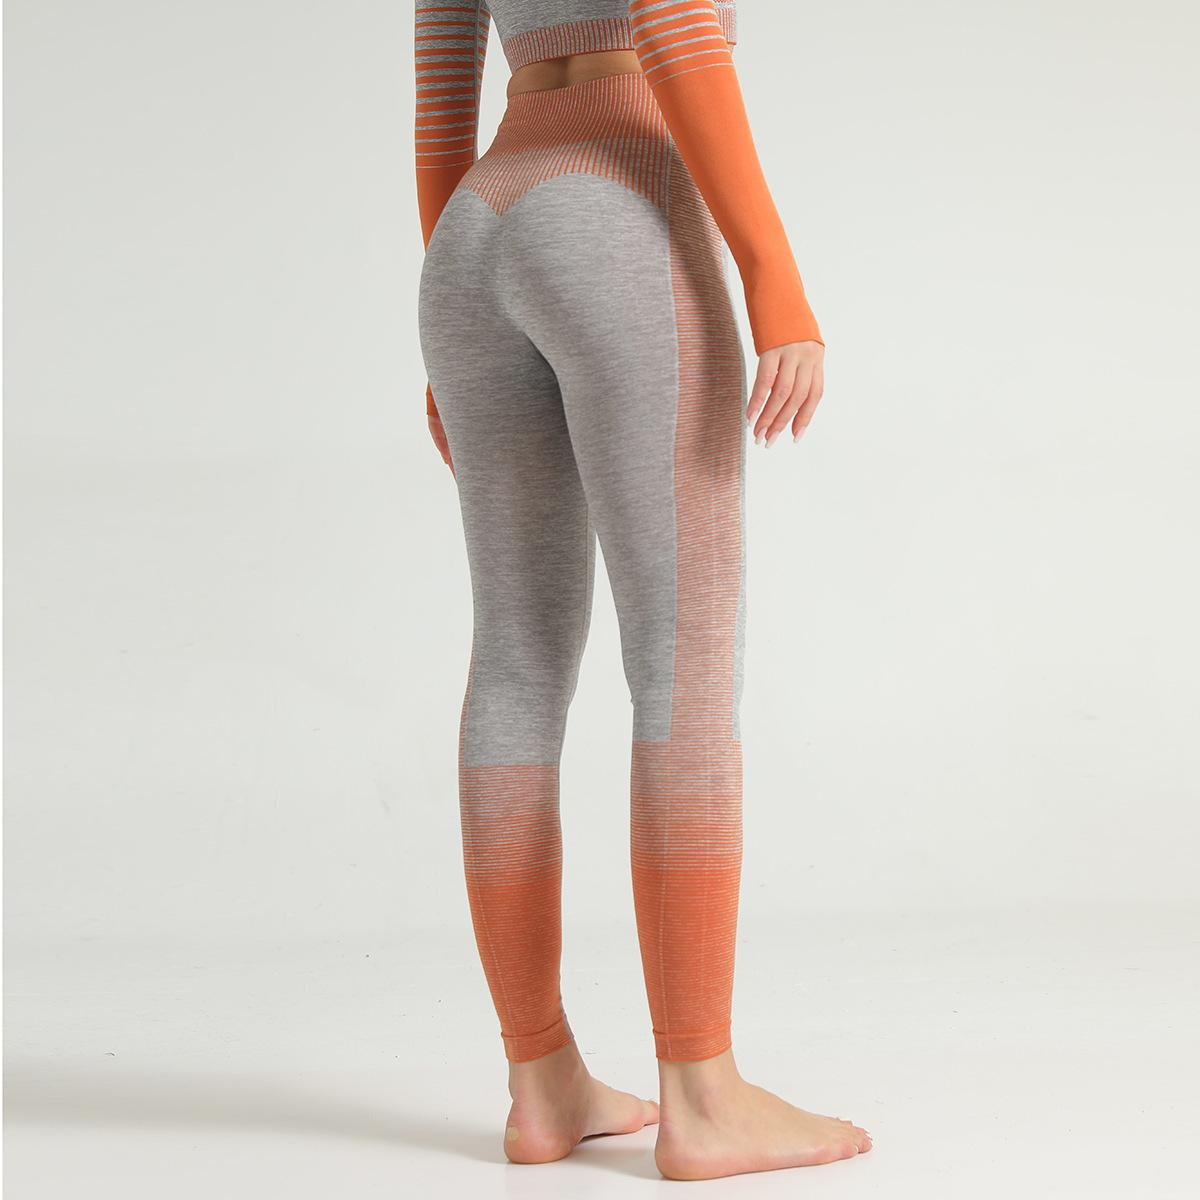 Sorunsuz Stripes Örgü Yoga Fitness Serisi Gao Bel Kalça Sıkı Fit Spor Yoga Pantolon Kadın Para